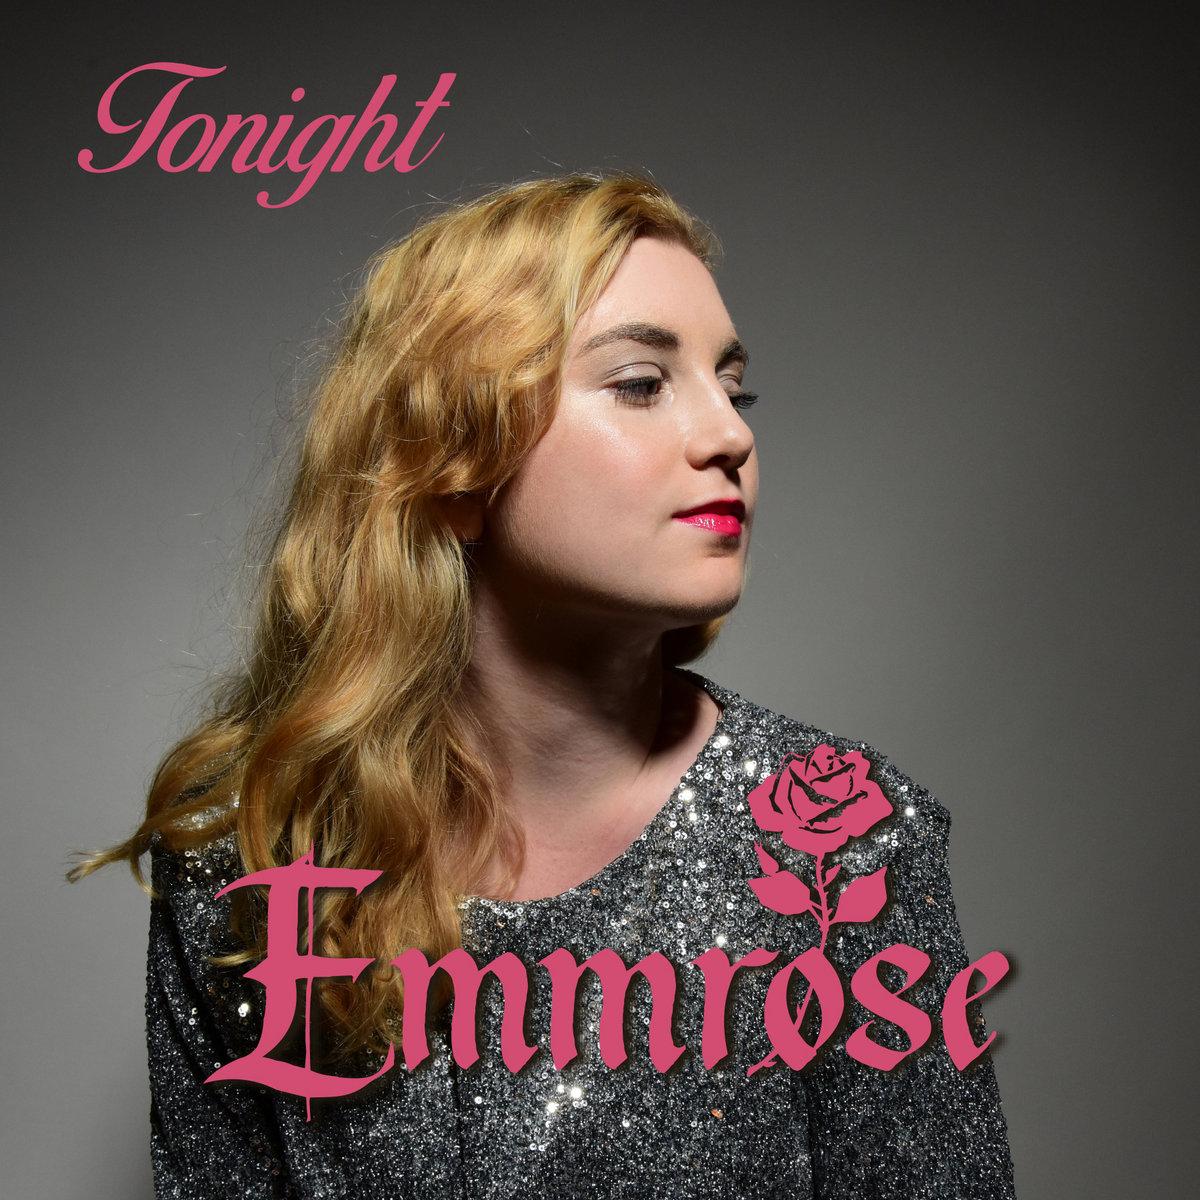 Tonight by Emmrose